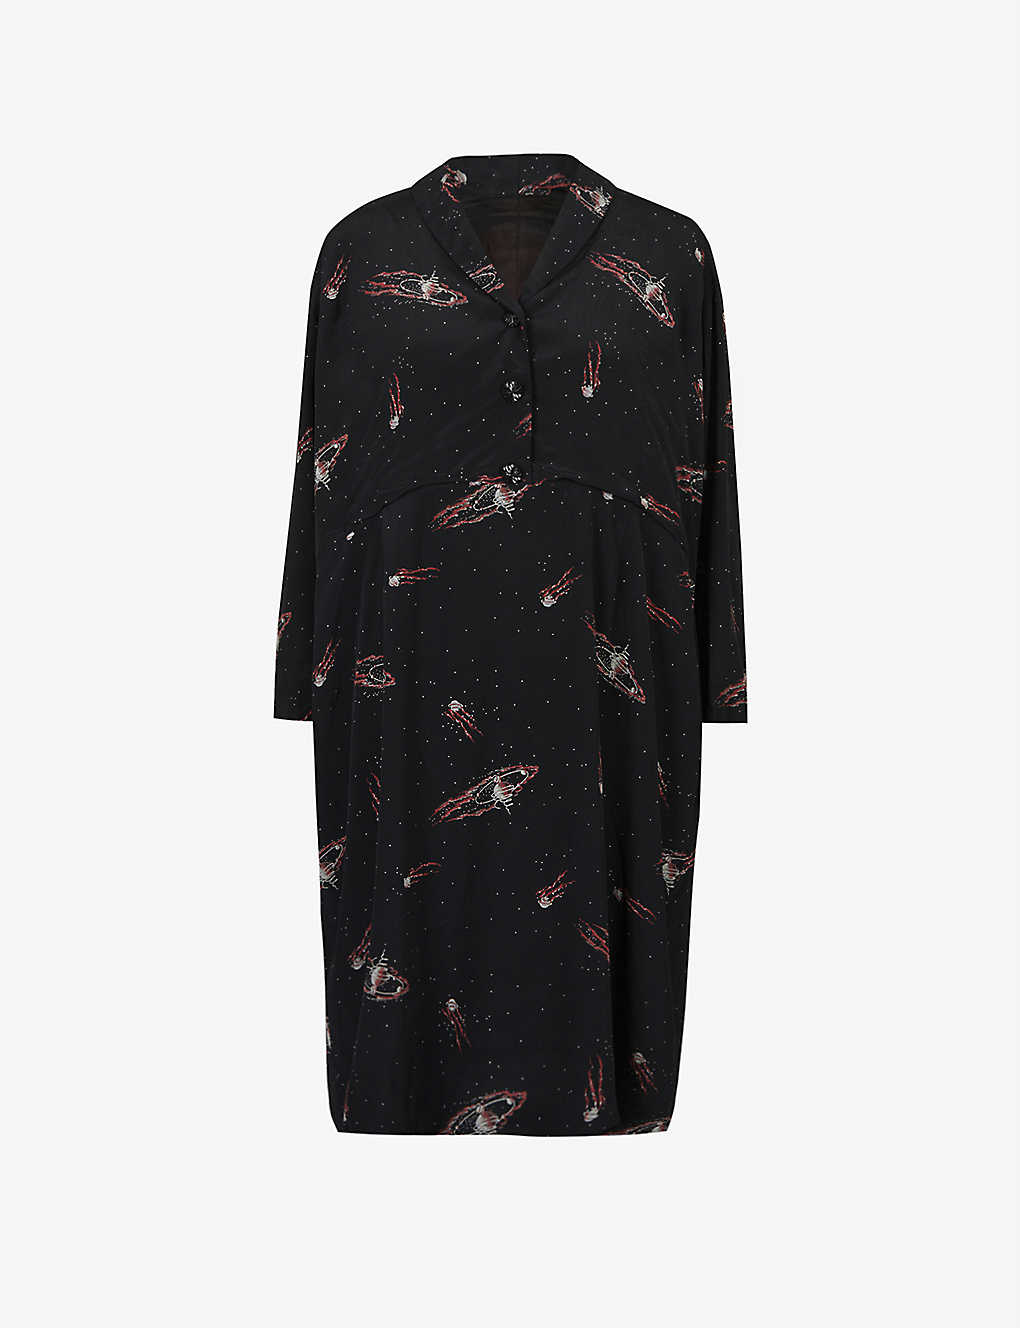 Pre-loved 1950s galactic-print crepe midi dress